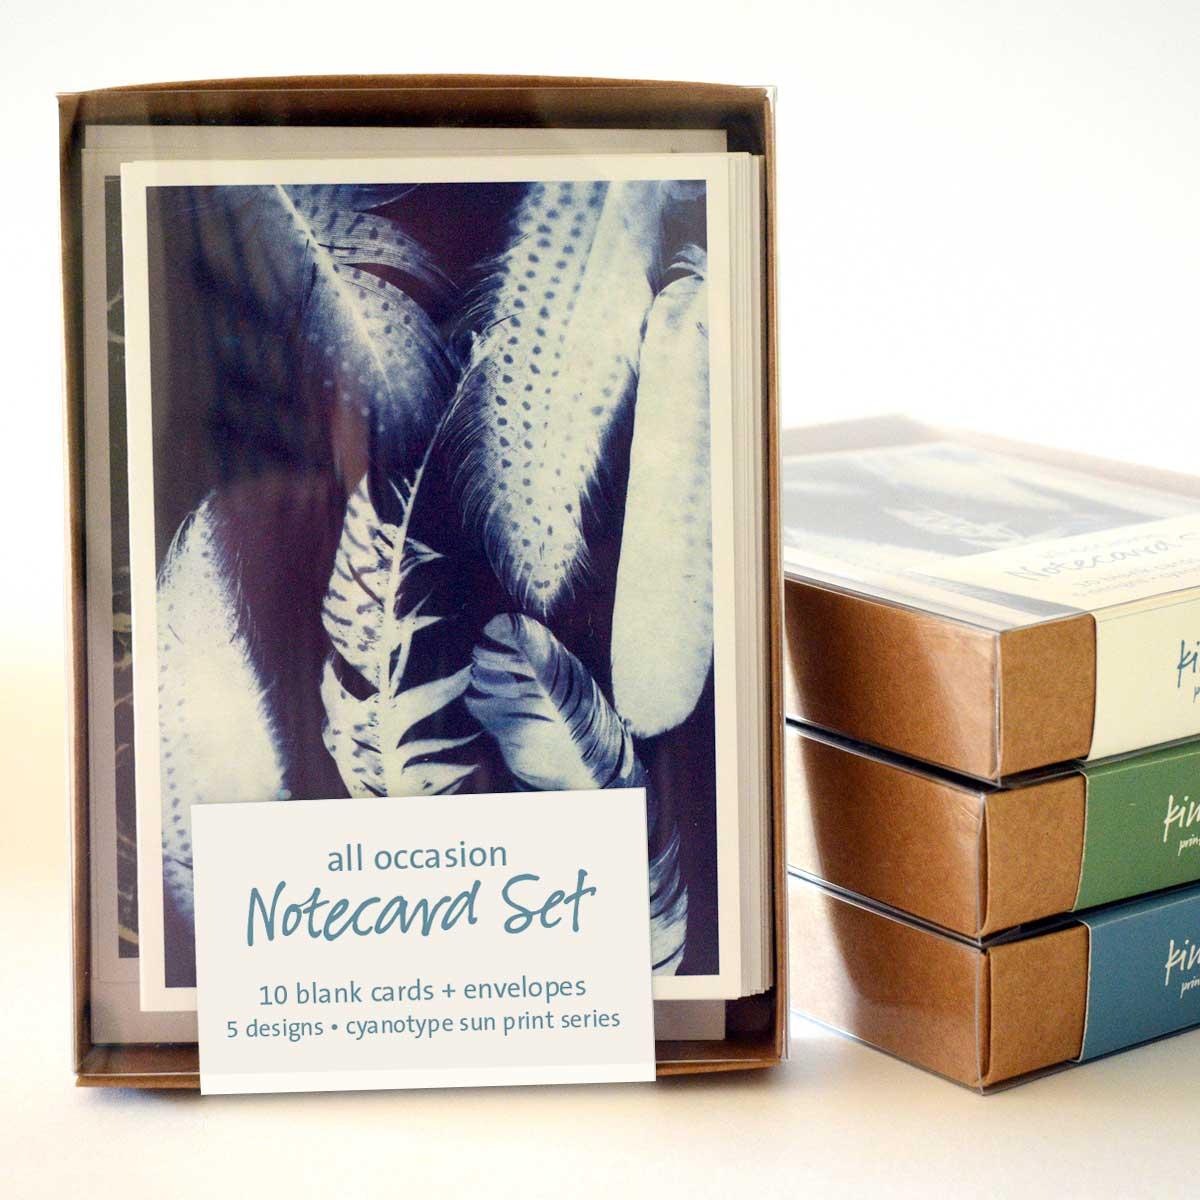 Cyanotype Notecard Set (10 cards)